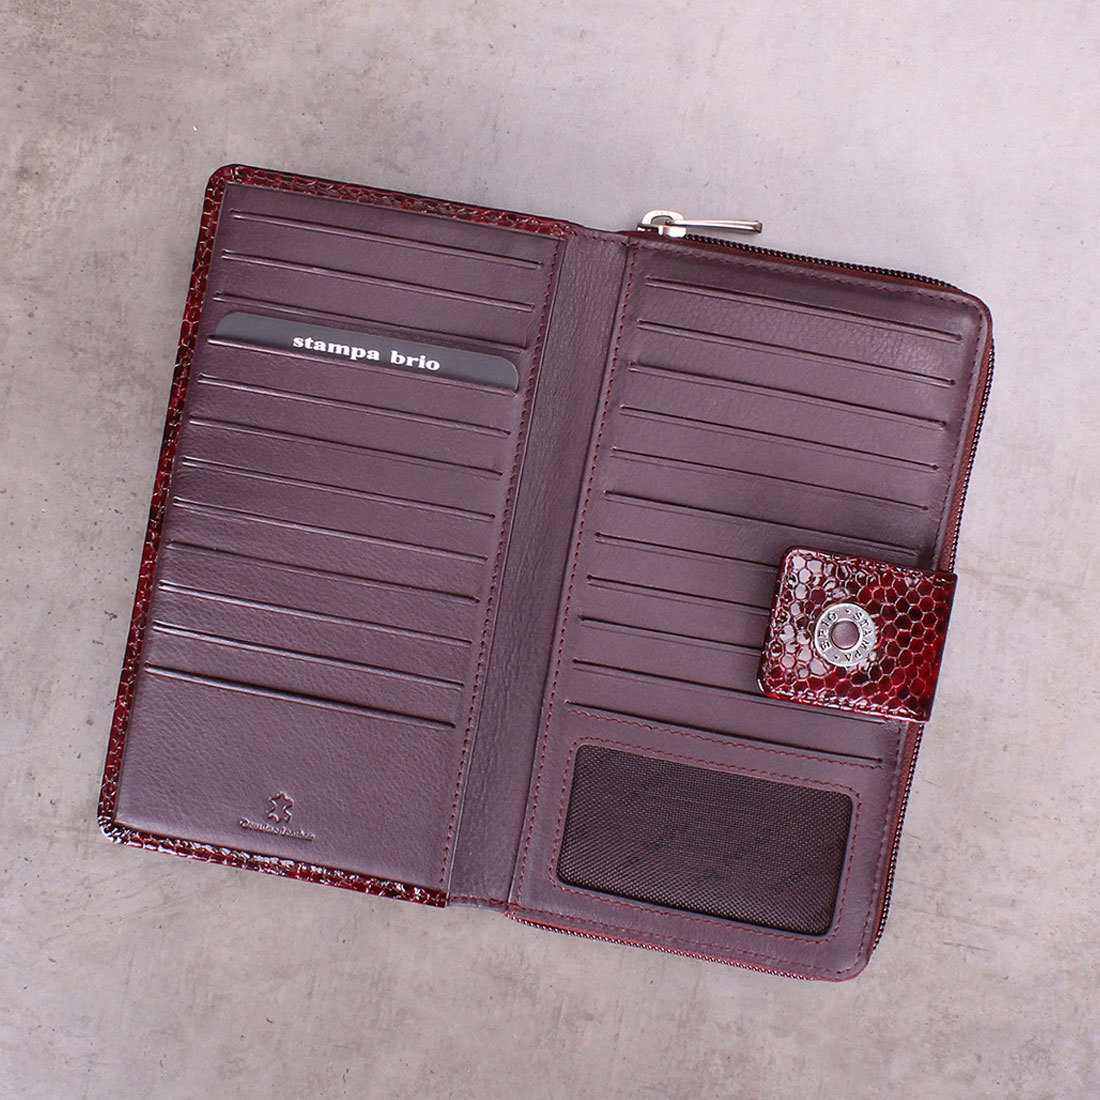 933 R - Портмоне-клатч с RFID защитой